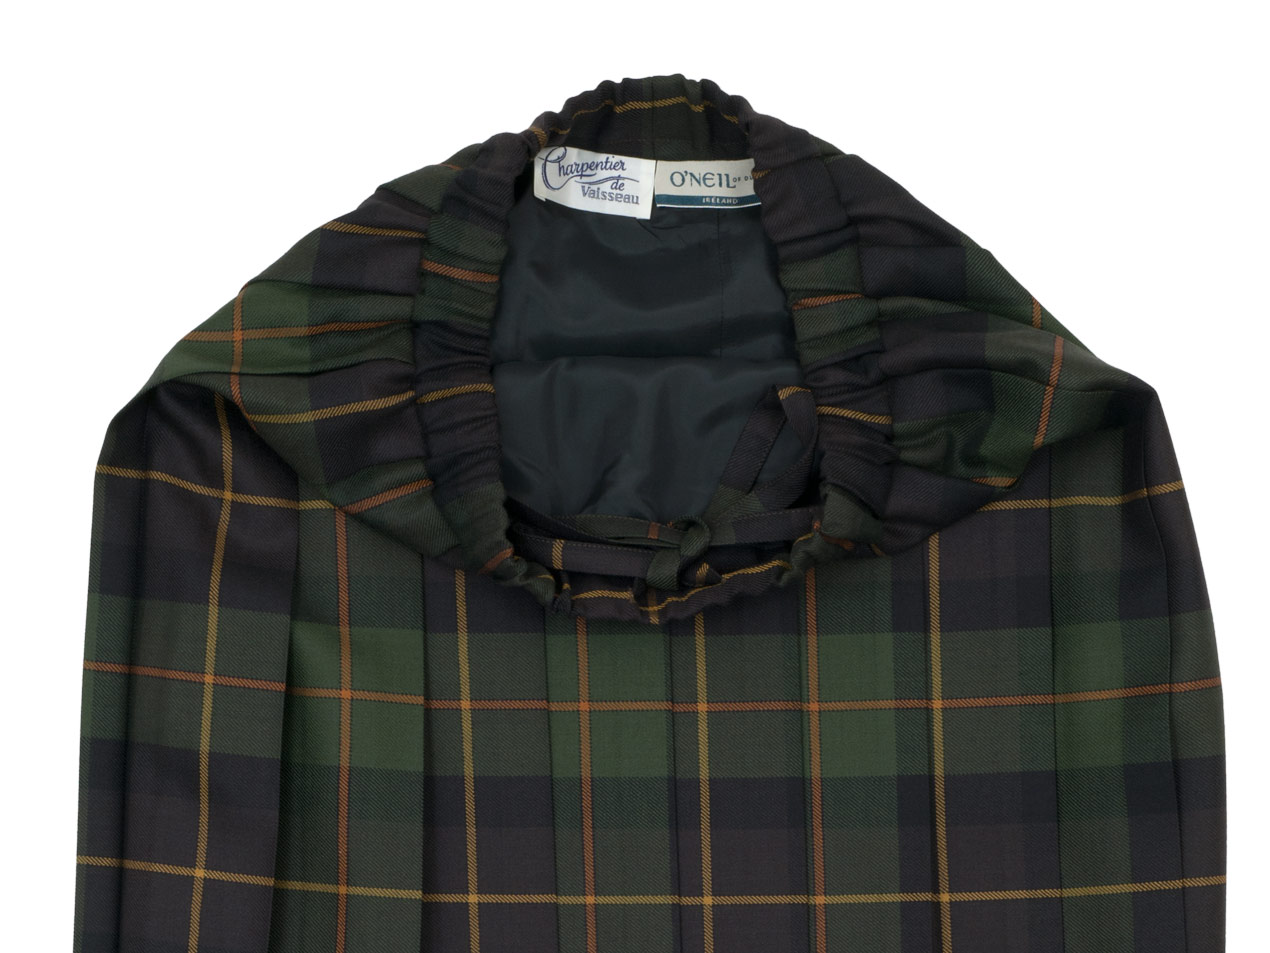 Charpentier de Vaisseau Bona O'neil of Dublin プリーツスカート